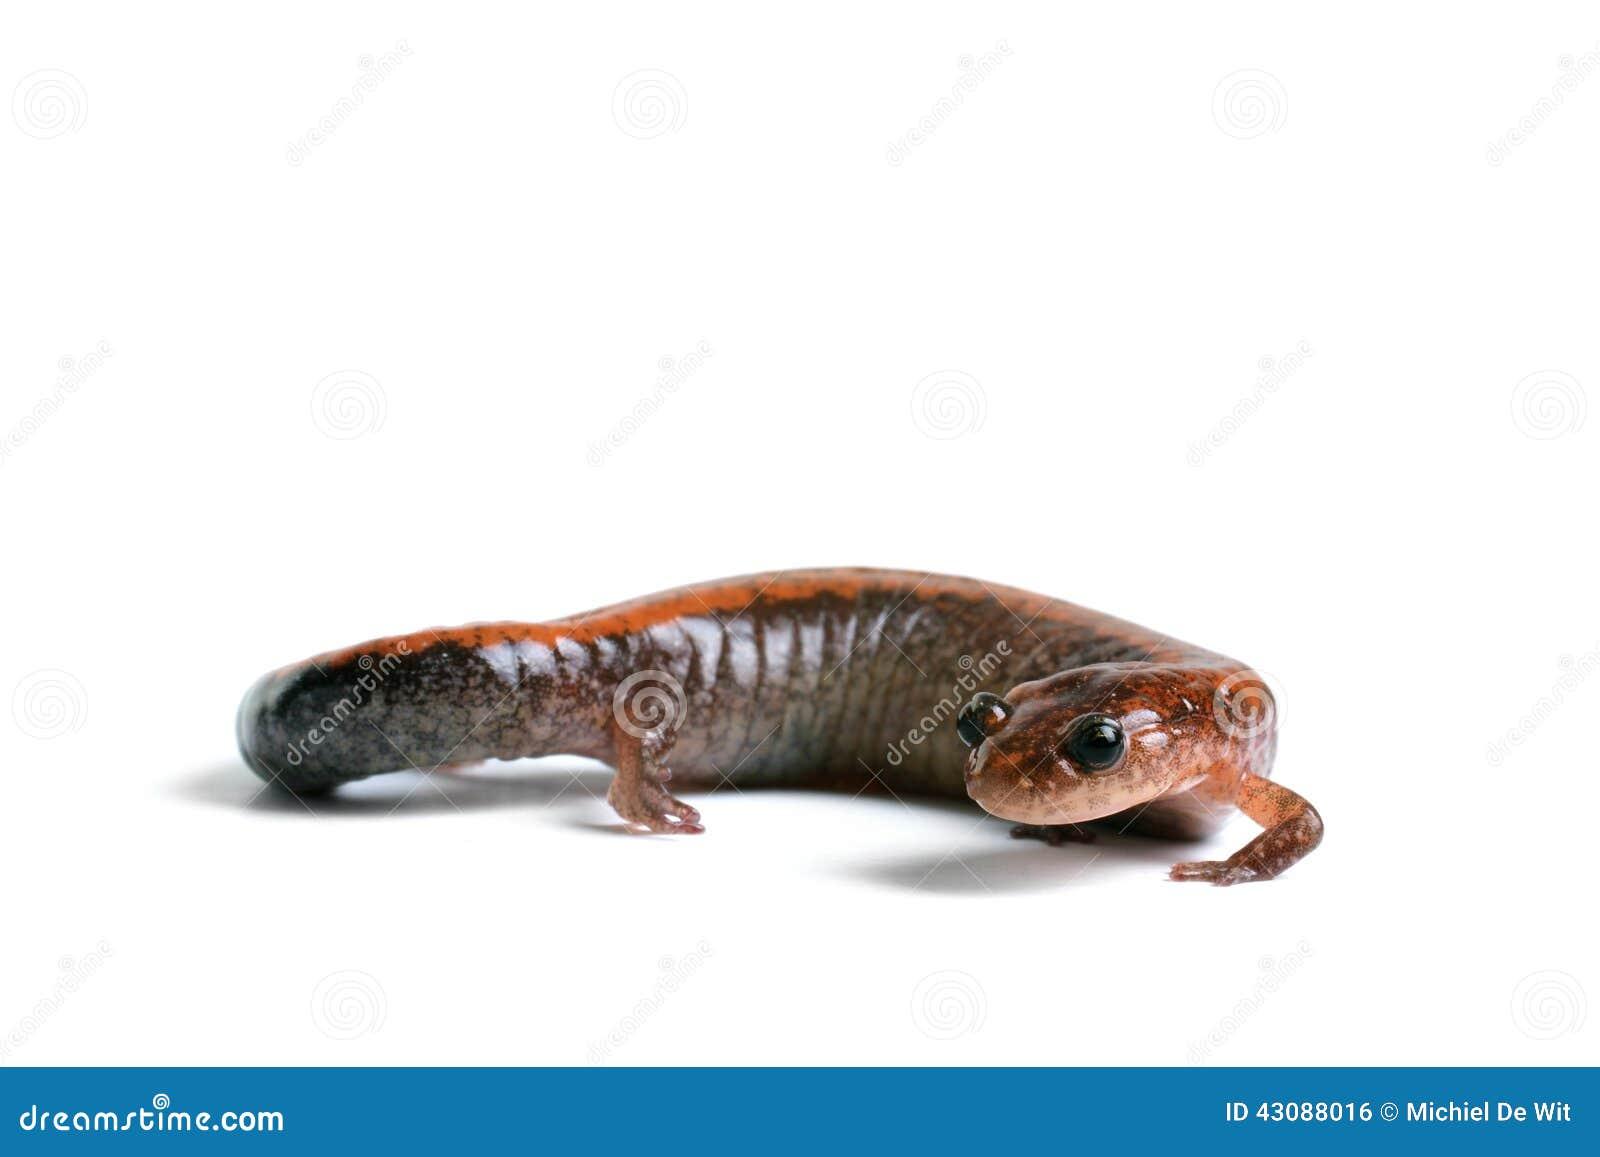 salamander white background - photo #11